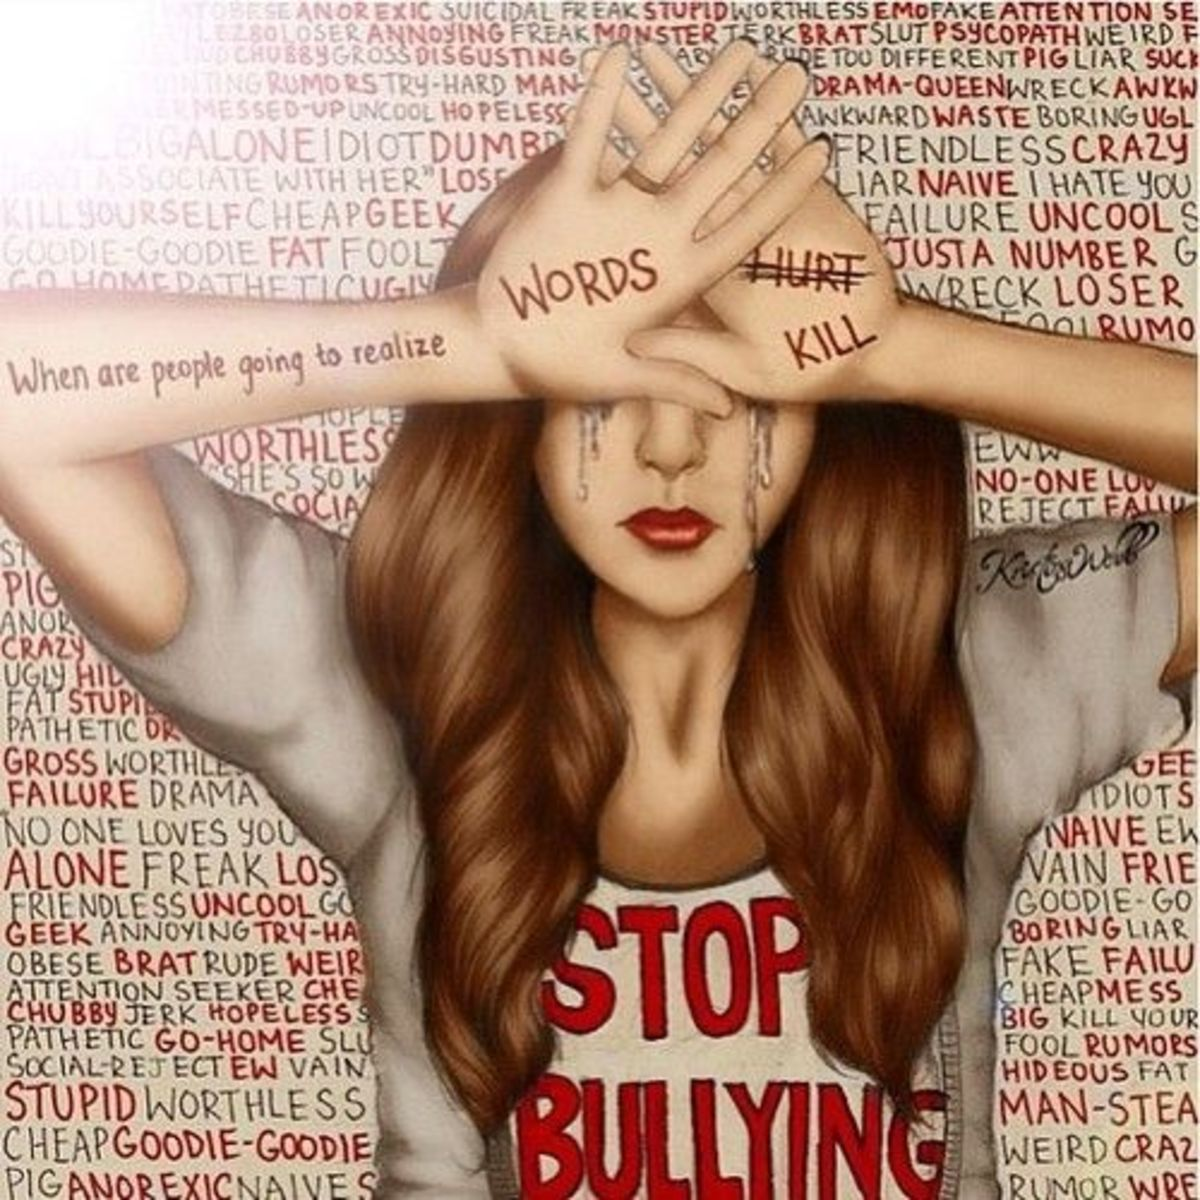 Handling Bullies